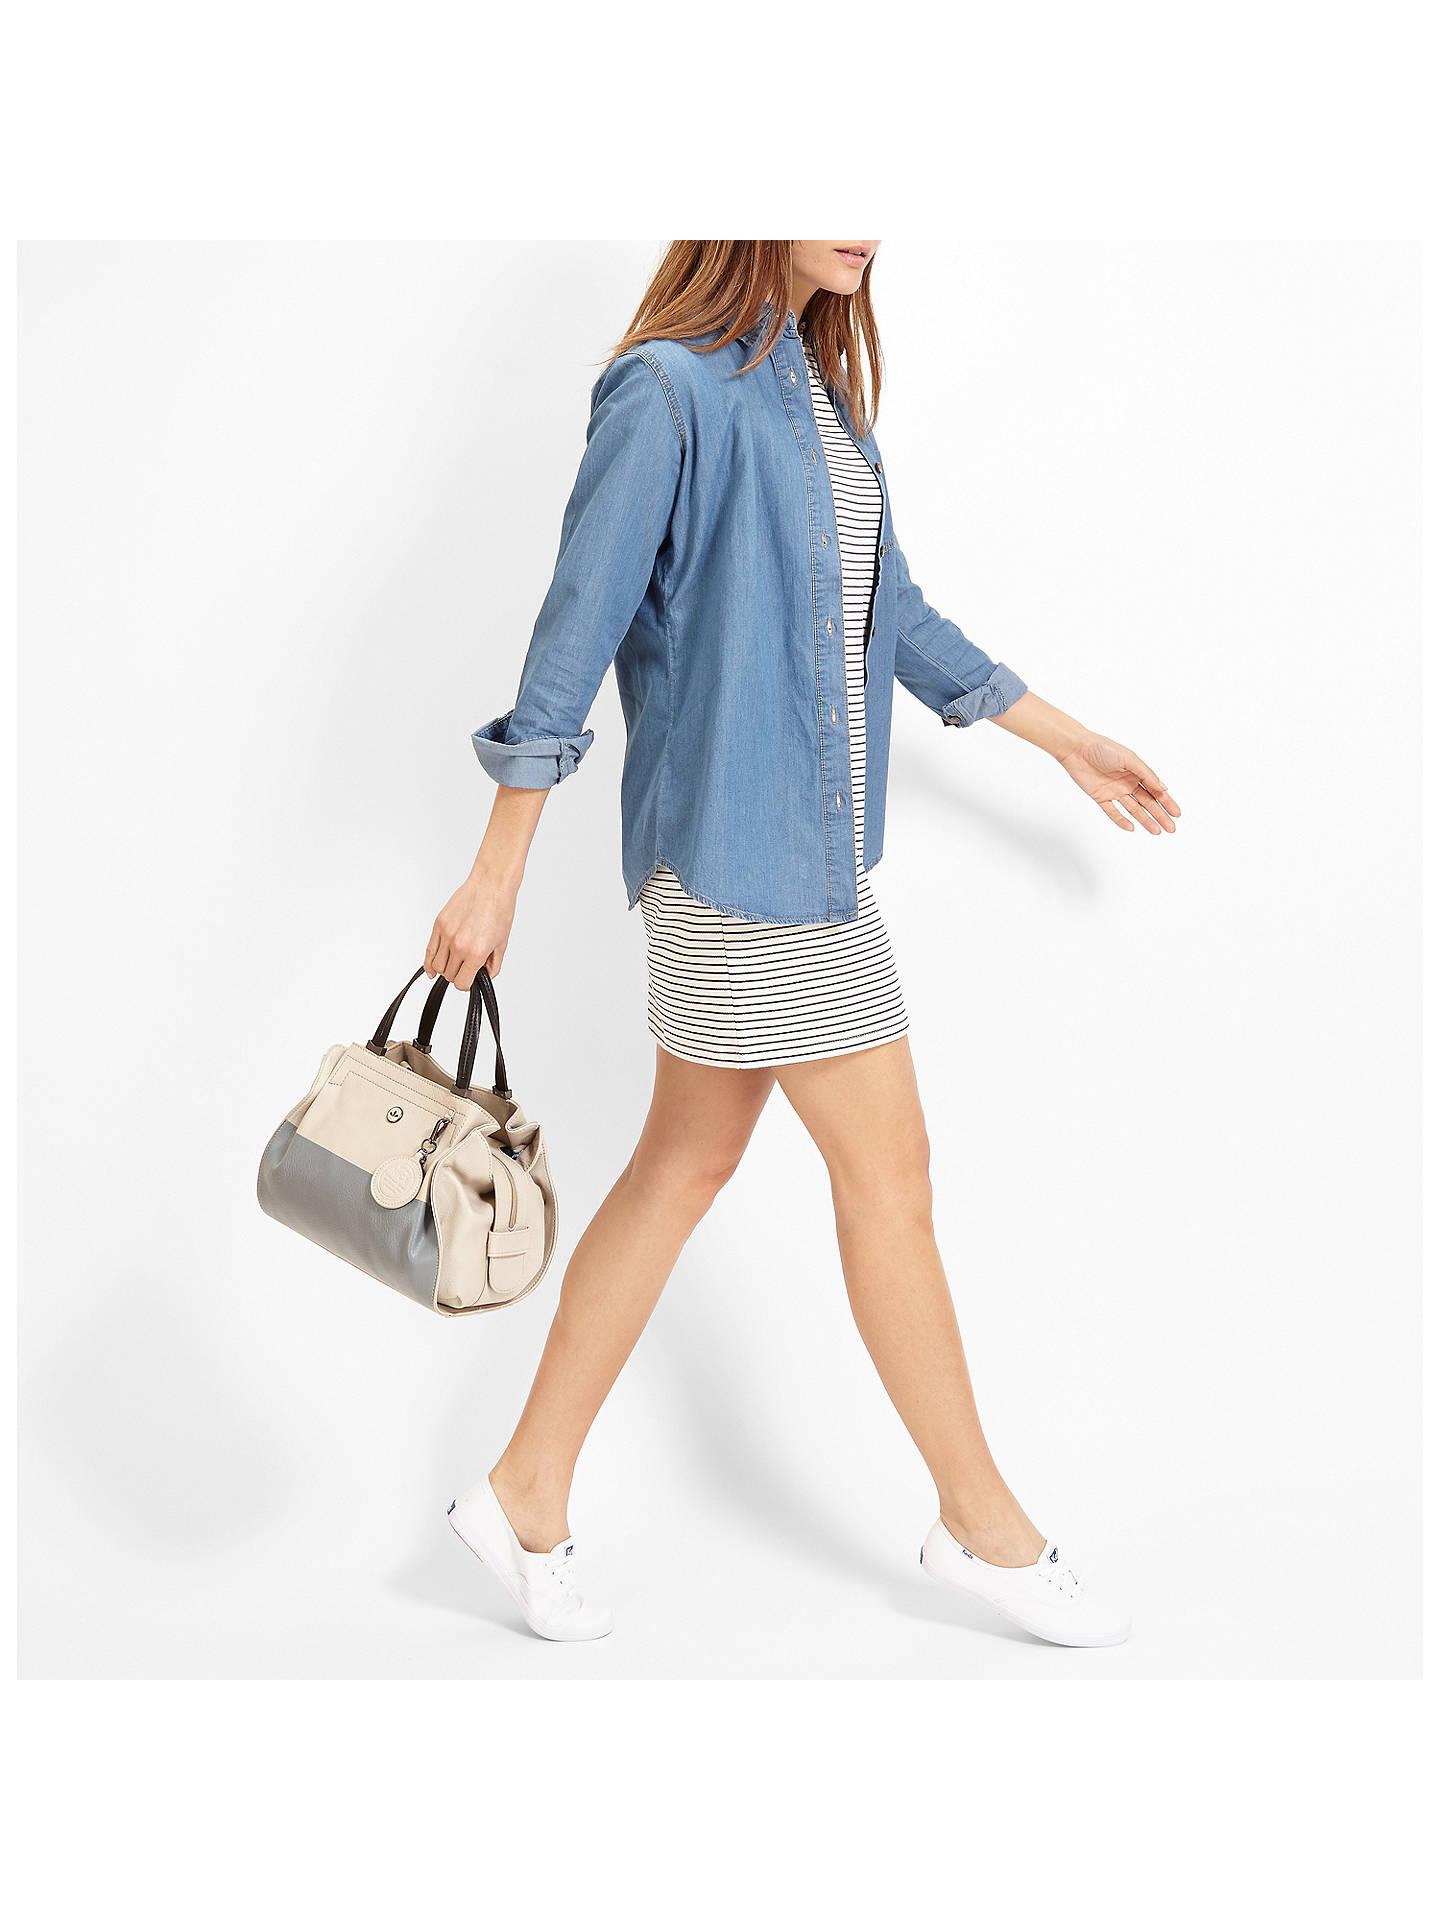 b3e527328f2 ... Buy Nica Ava Grab Bag, Stone Online at johnlewis.com